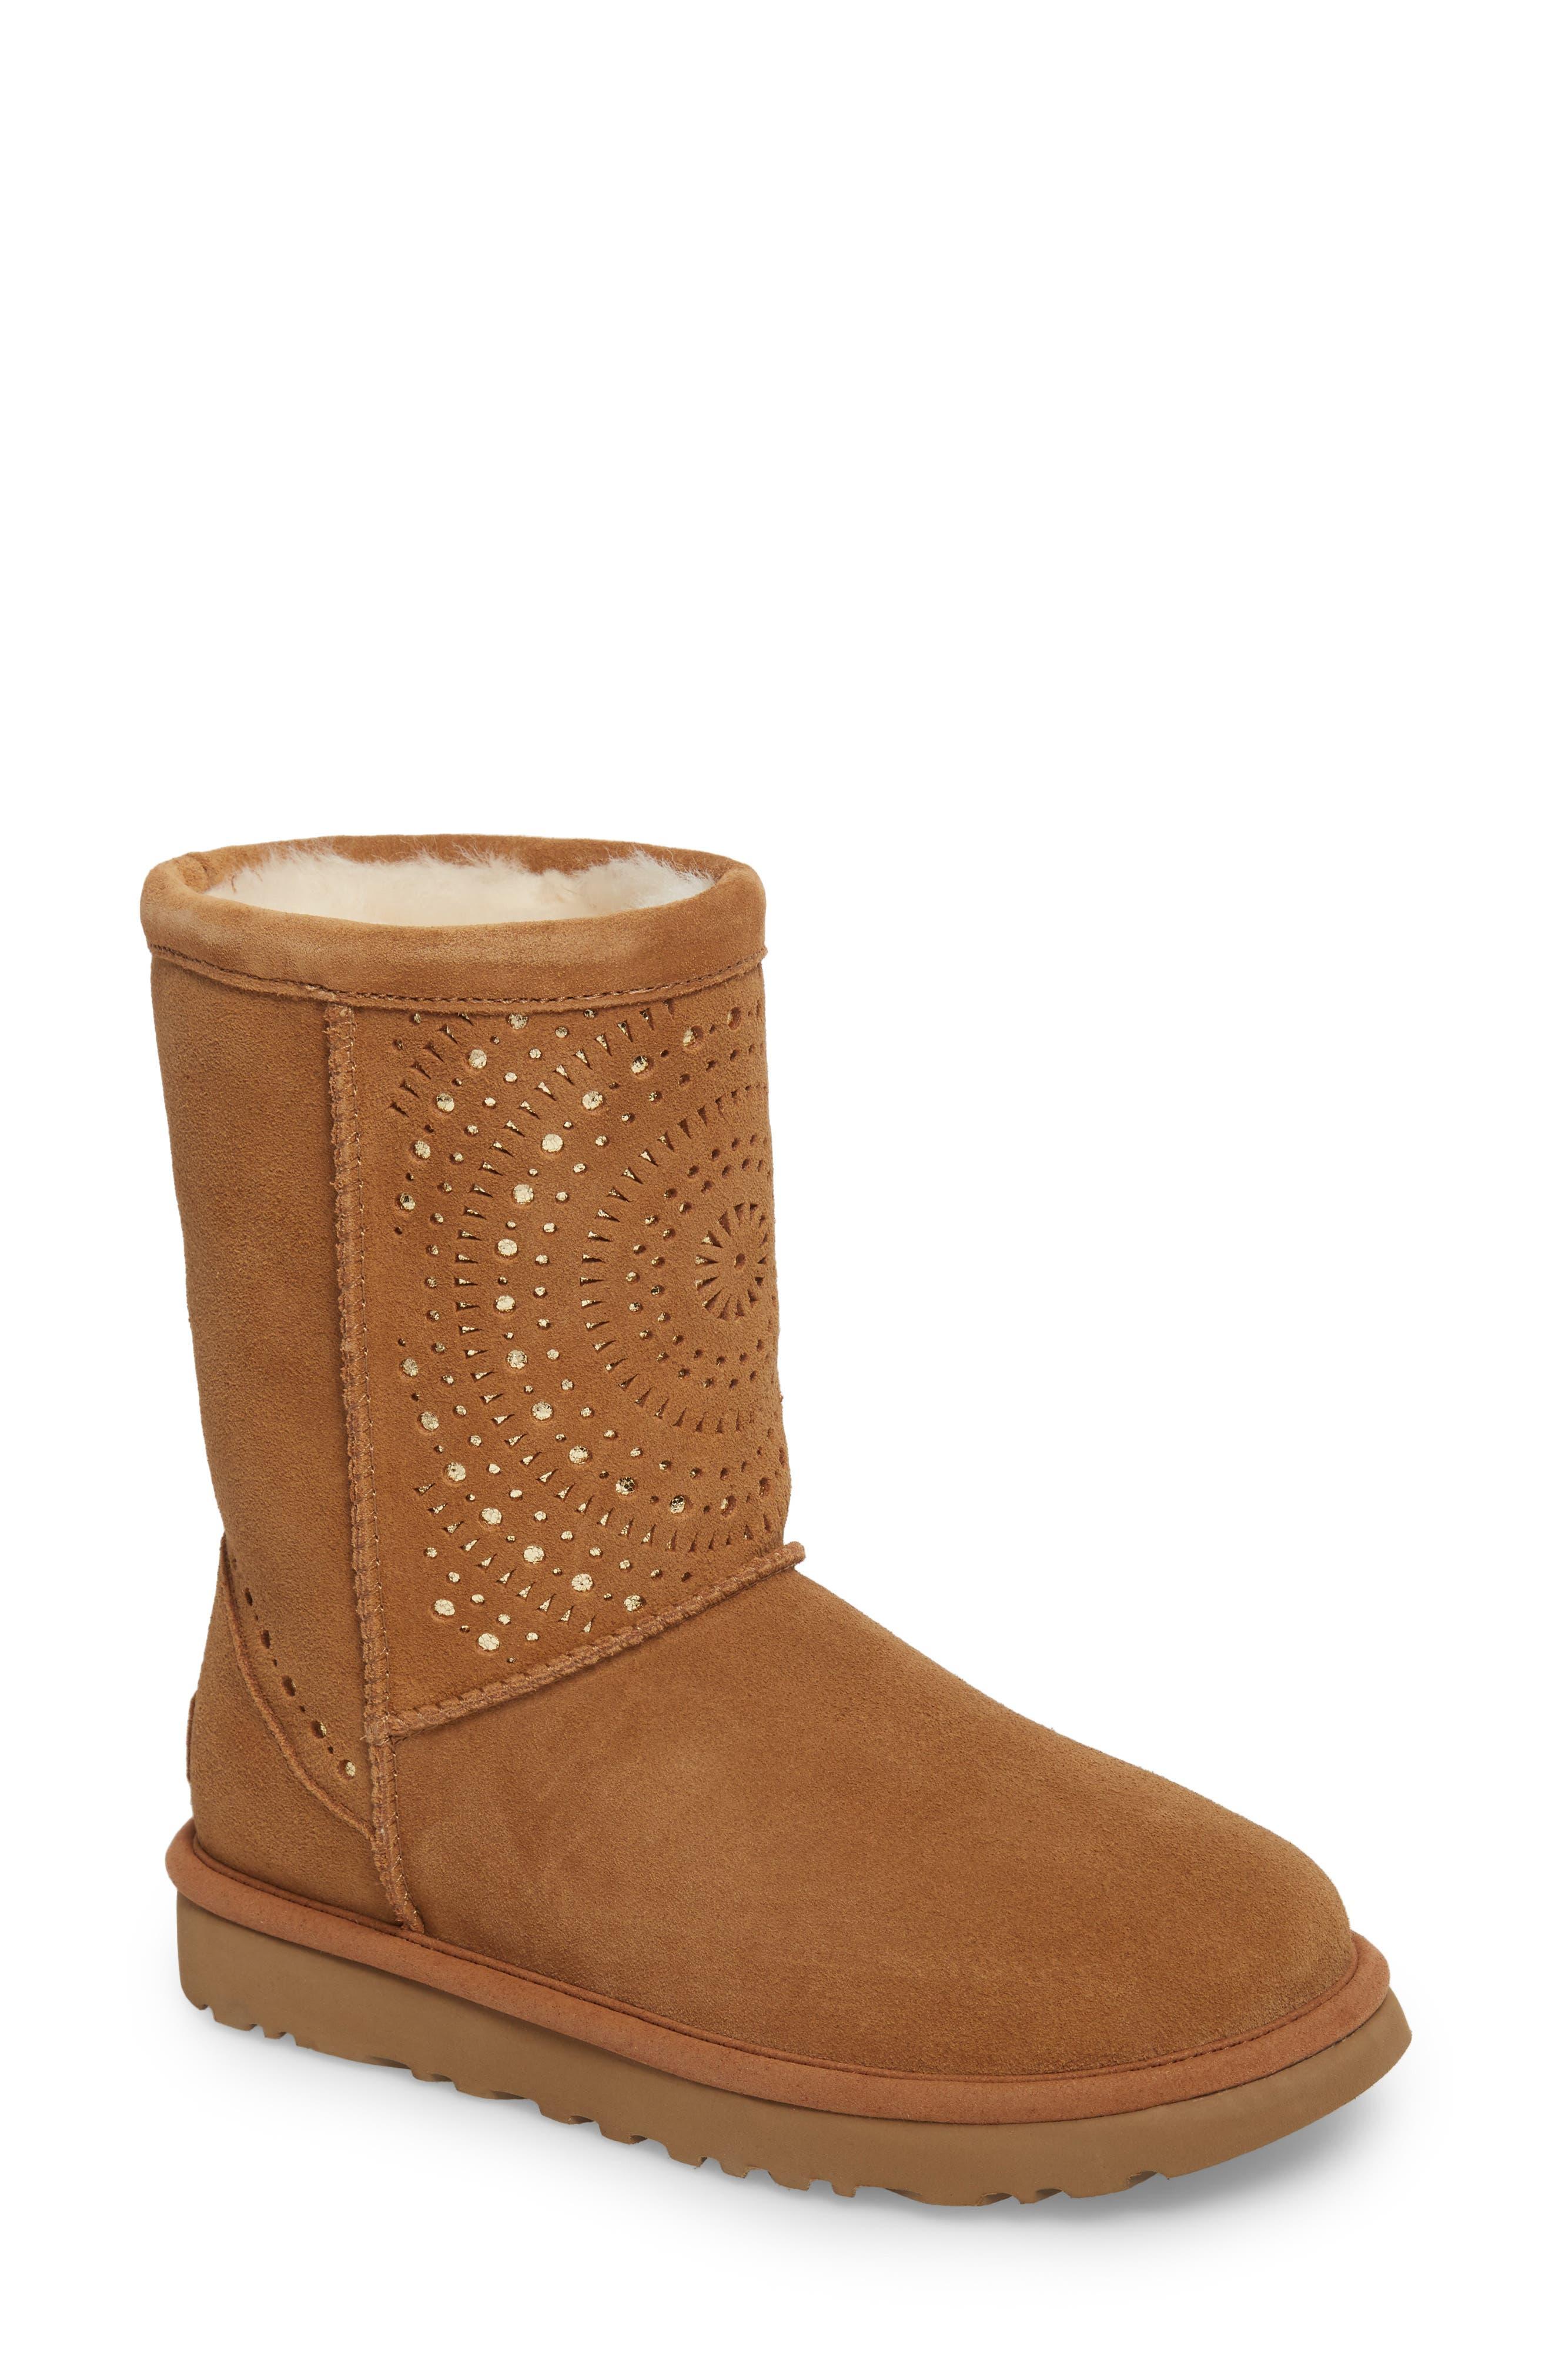 Main Image - UGG® Classic Short Sunshine Perforated Boot (Women)